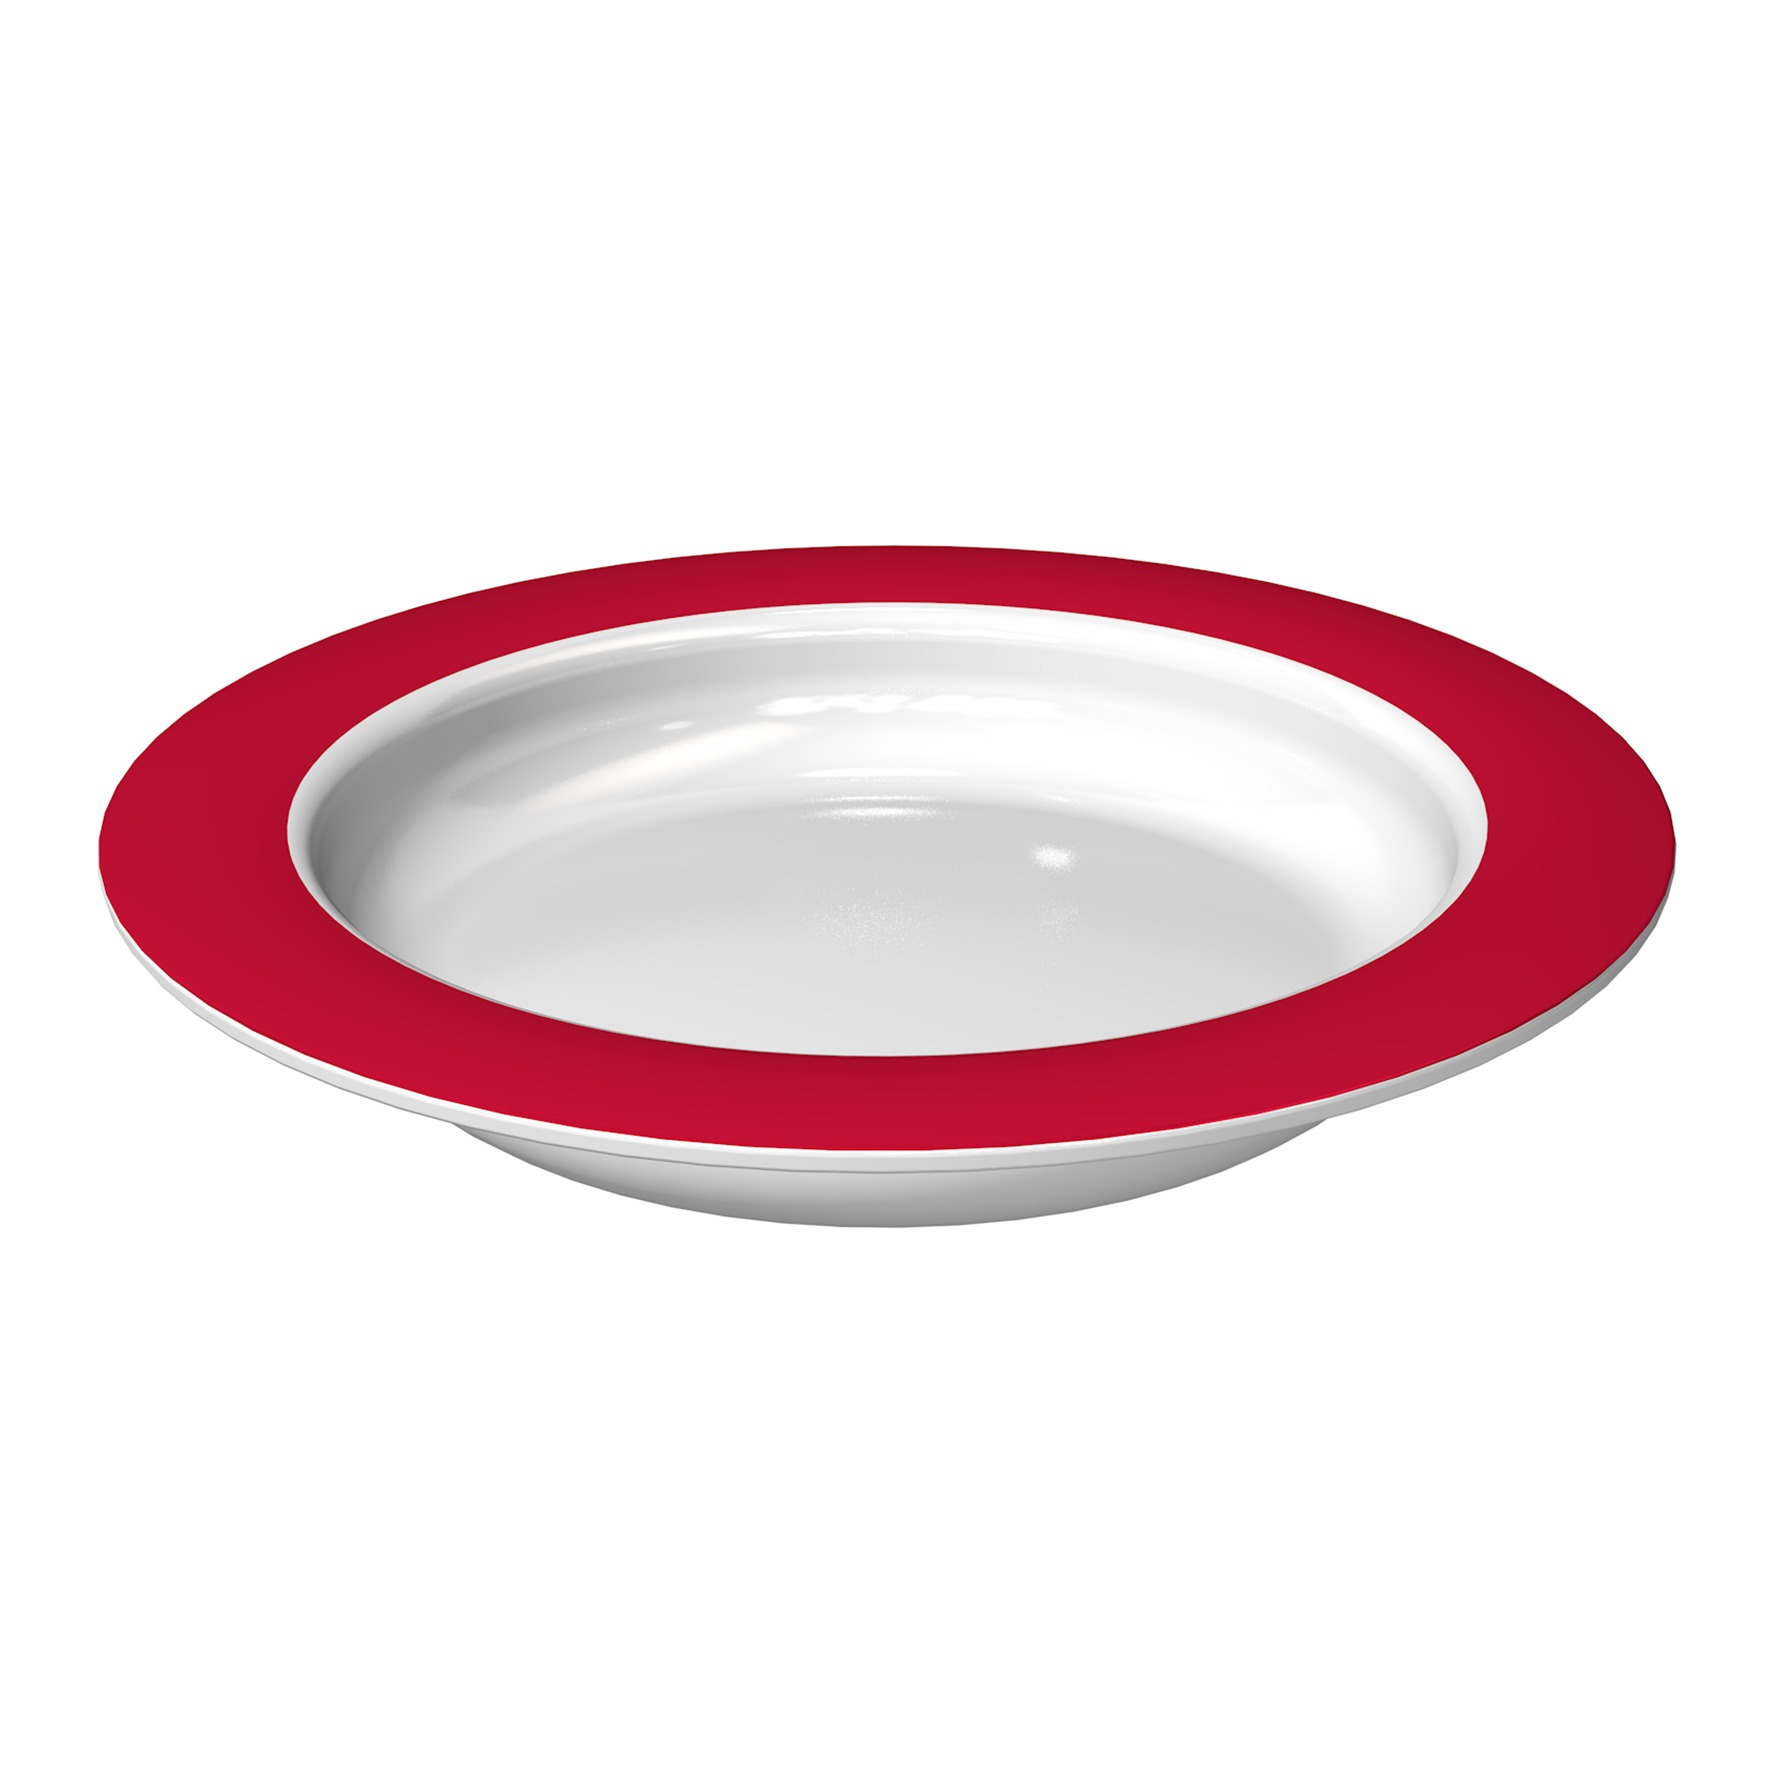 Plate with Sloped Base Ø 20 cm